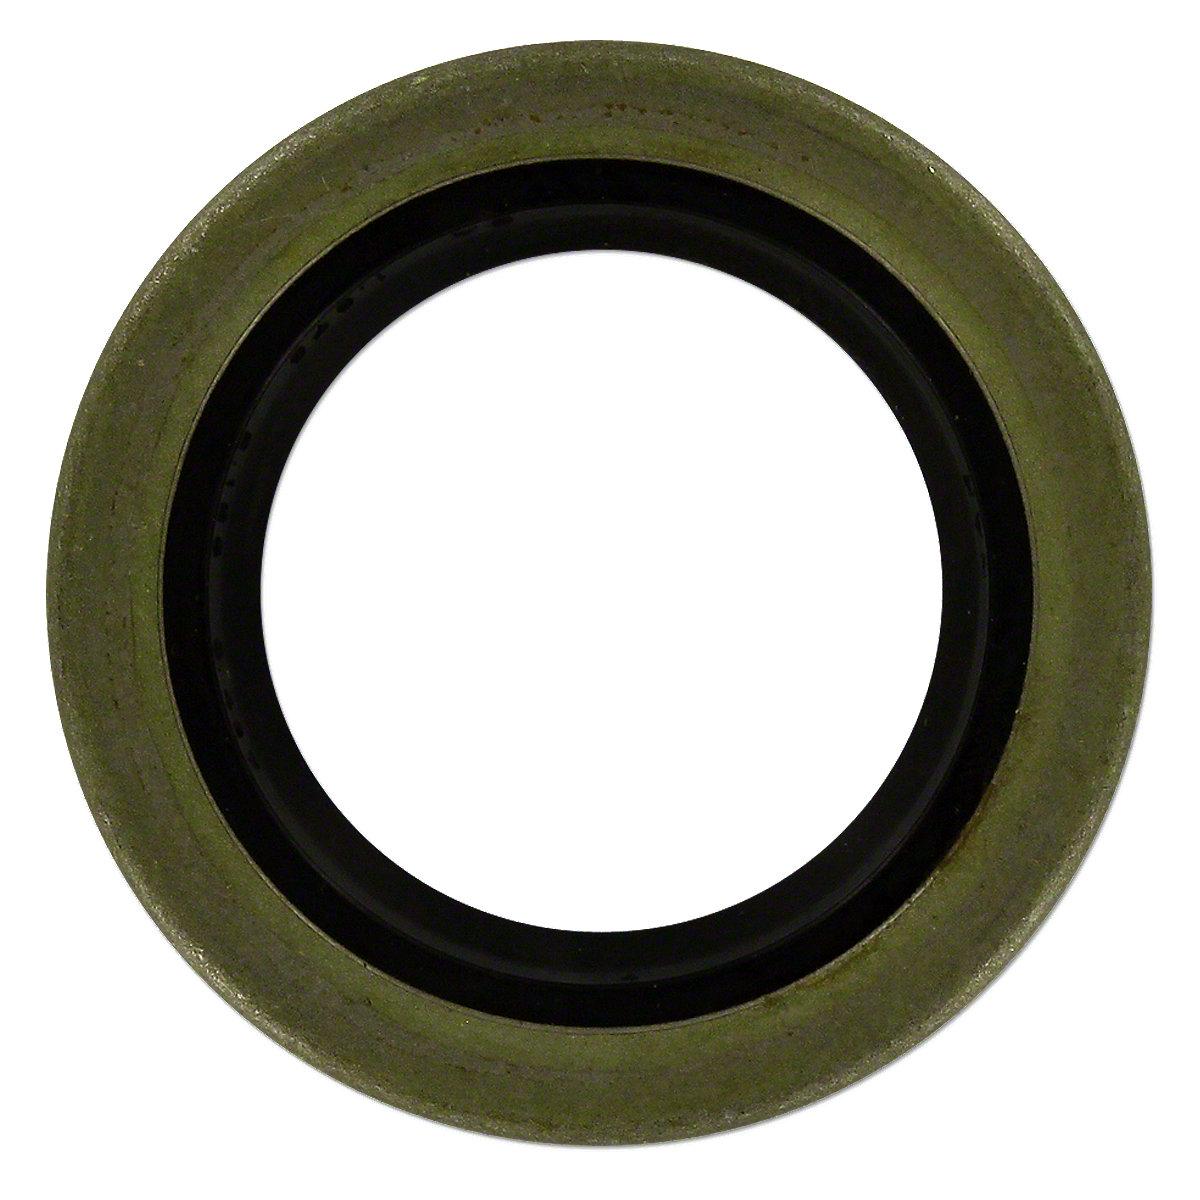 Outer PTO Oil Seal For Allis Chalmers: 190XT, B, C, CA, IB, D10, D12, D14, D15, D17, D19, 170, 180, 185, 190, 200, 615,